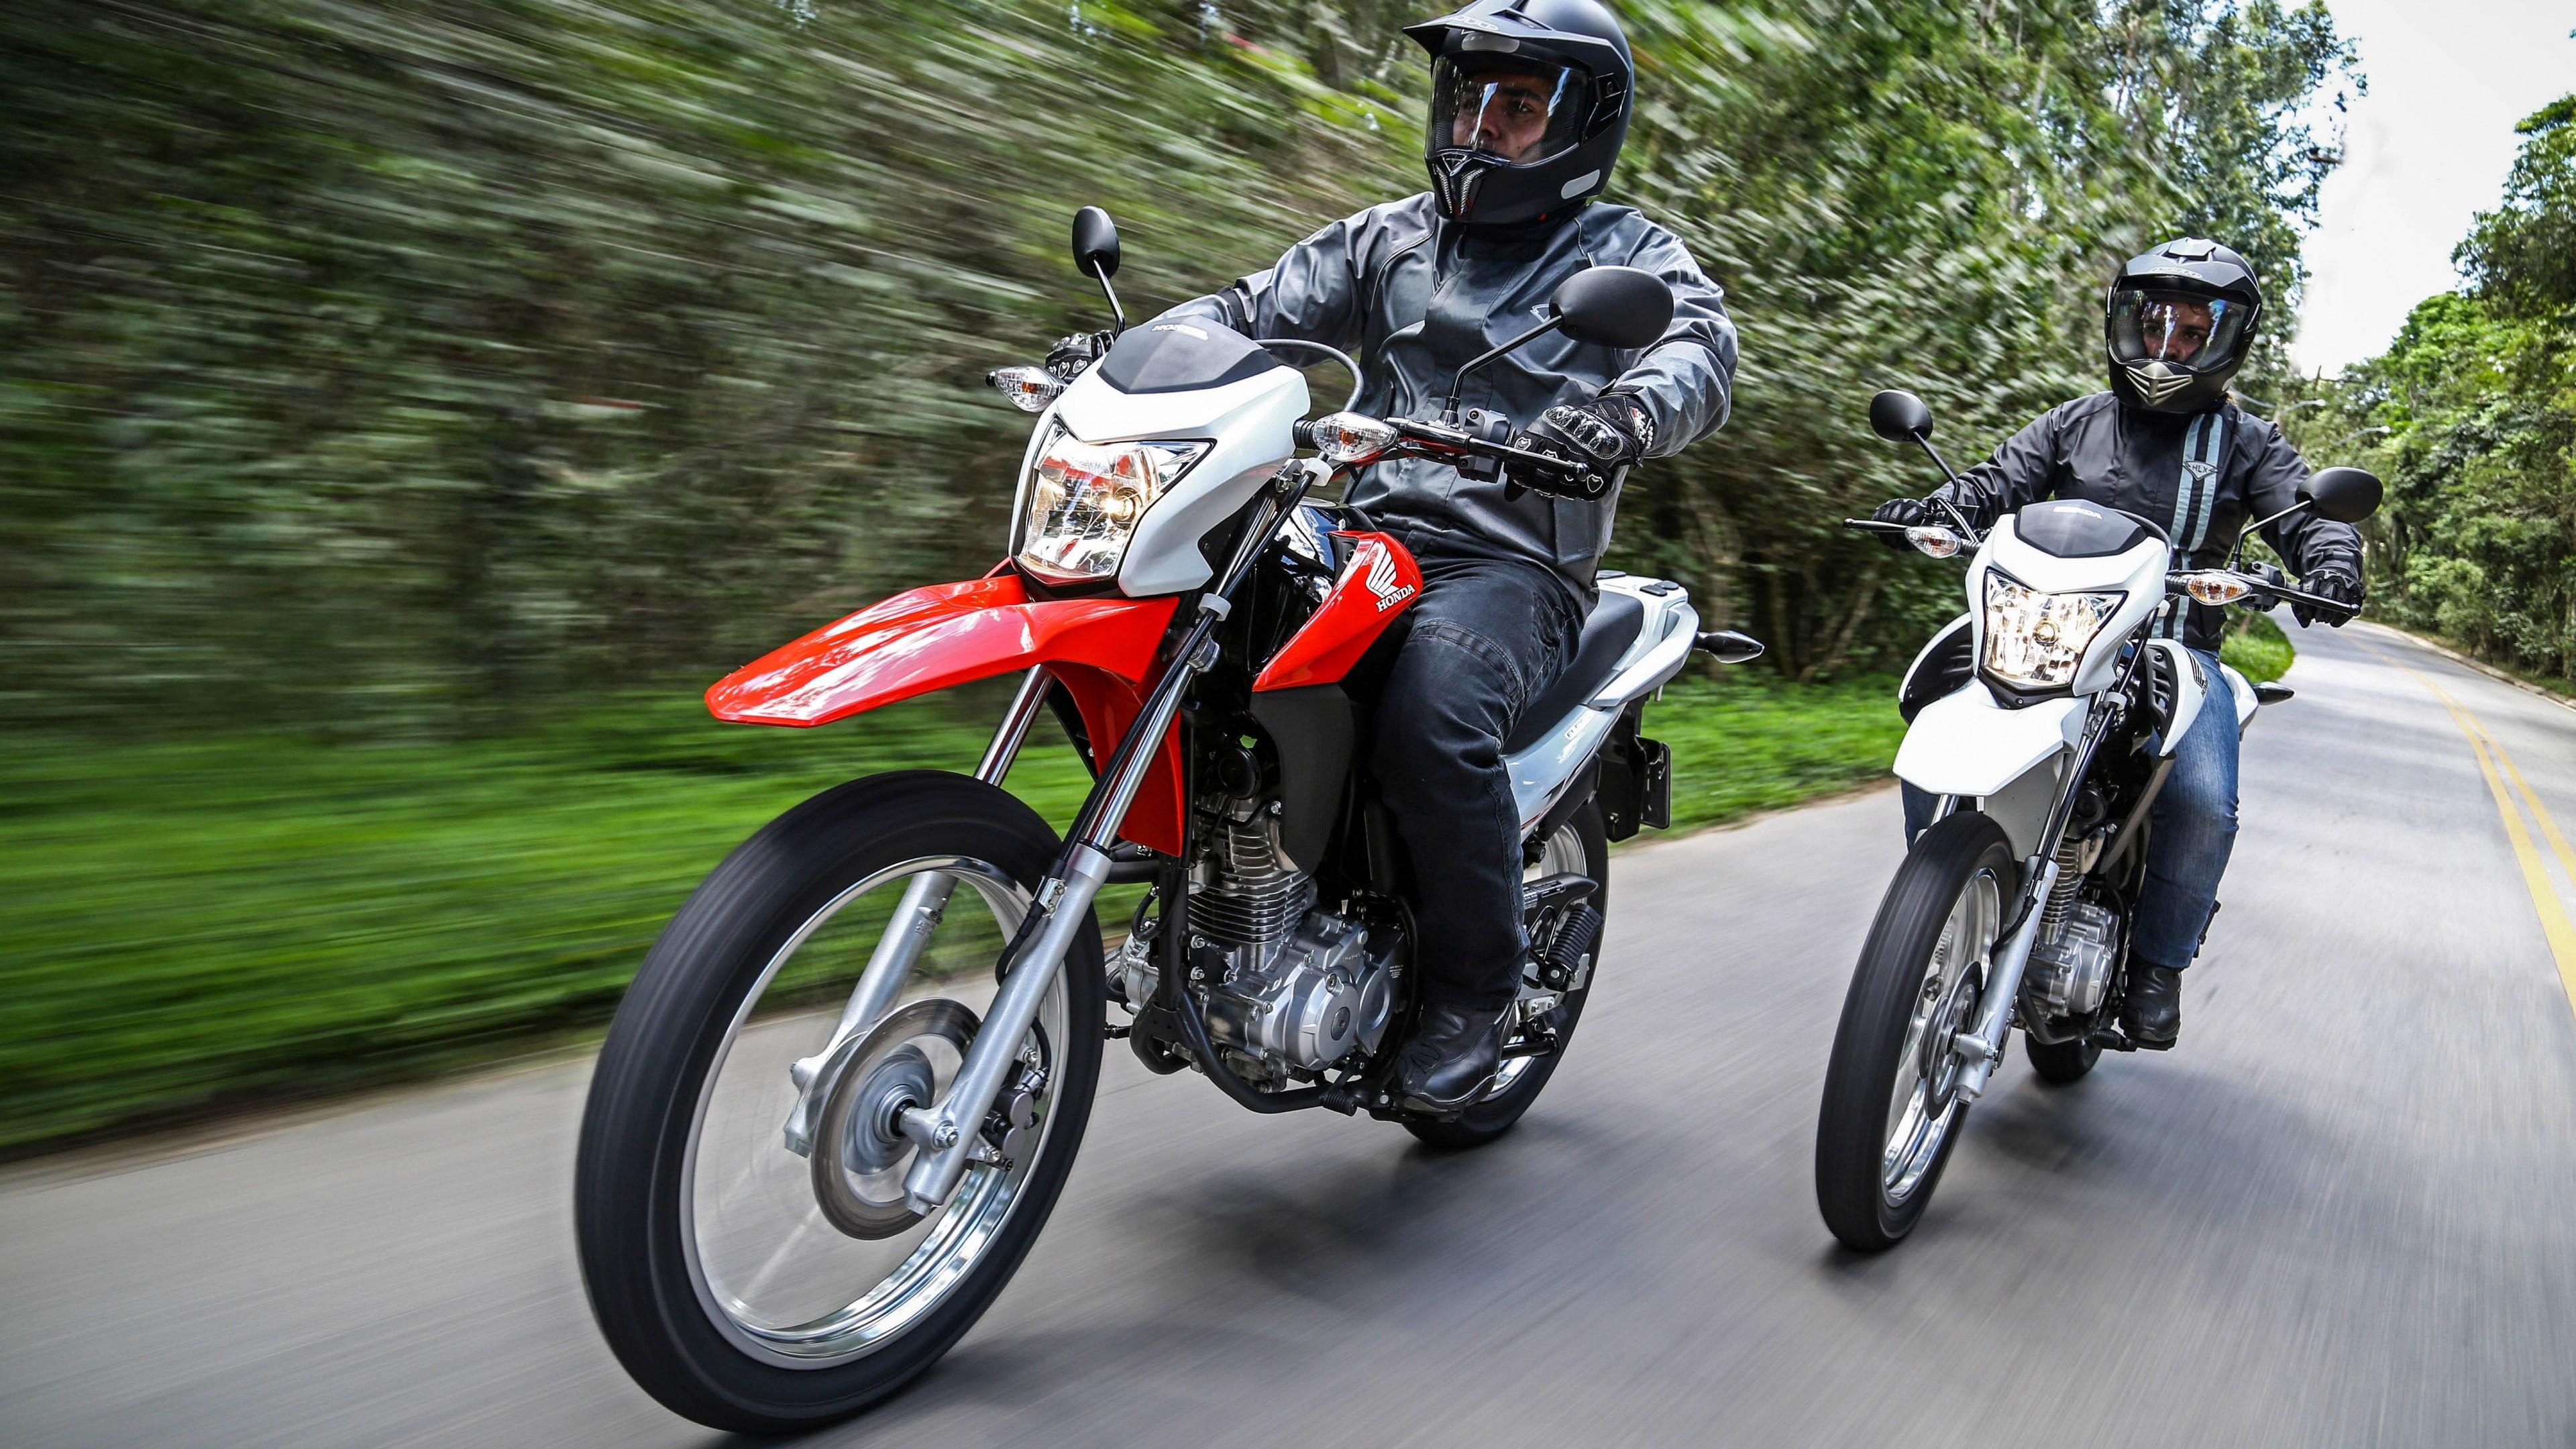 Wallpaper Honda Bros 160 MXR 160 Best Bikes 2015 motorcycle 3840x2160